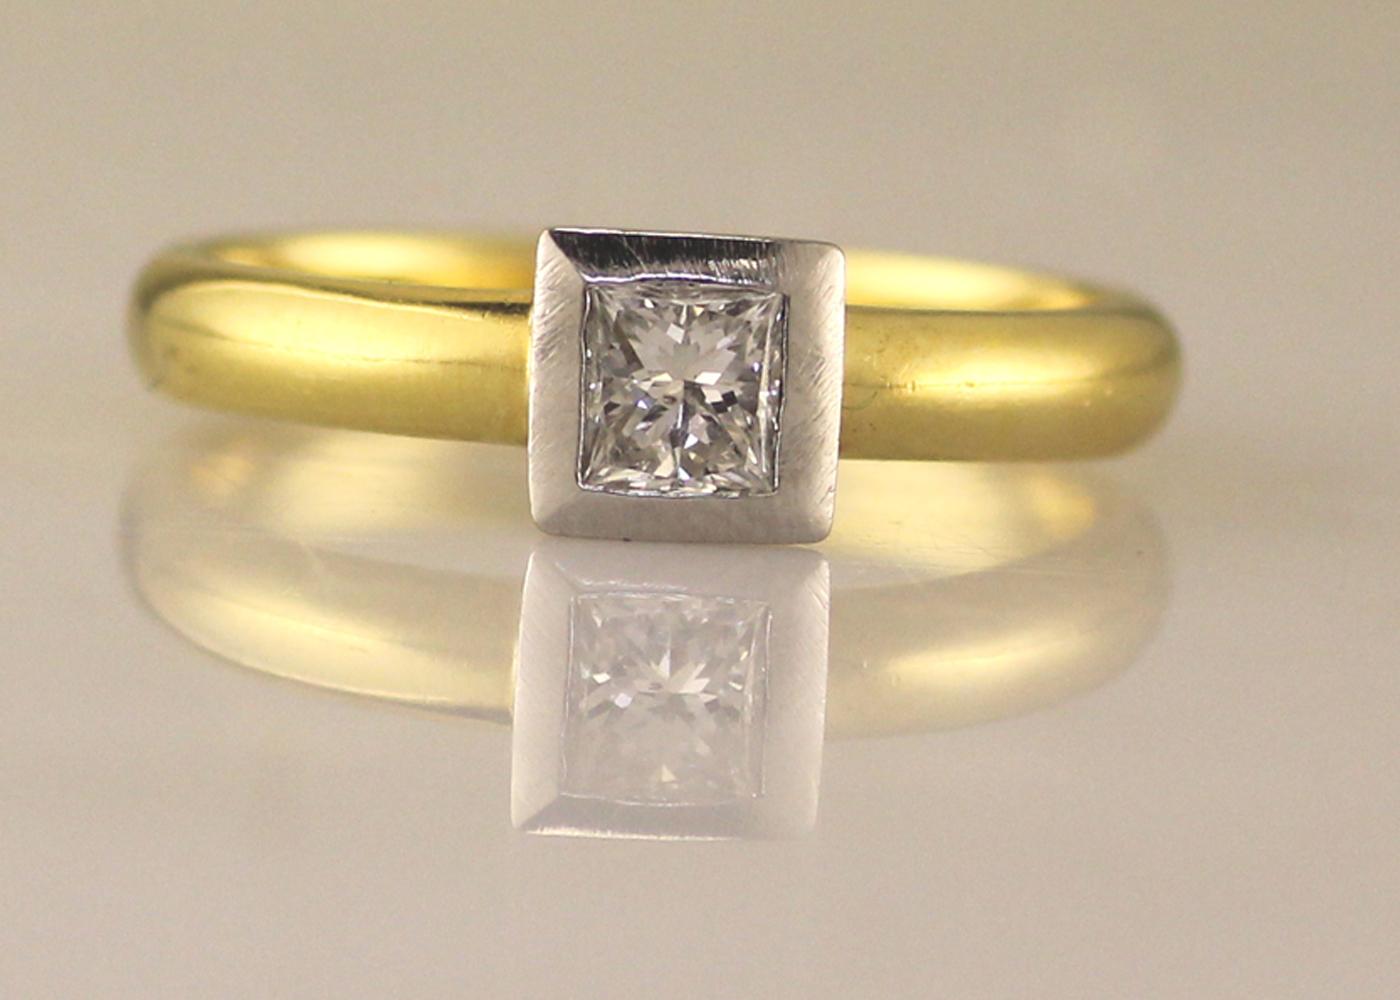 18ct Princess Cut Rub Over Diamond Ring 0.45 Carats - Image 6 of 8